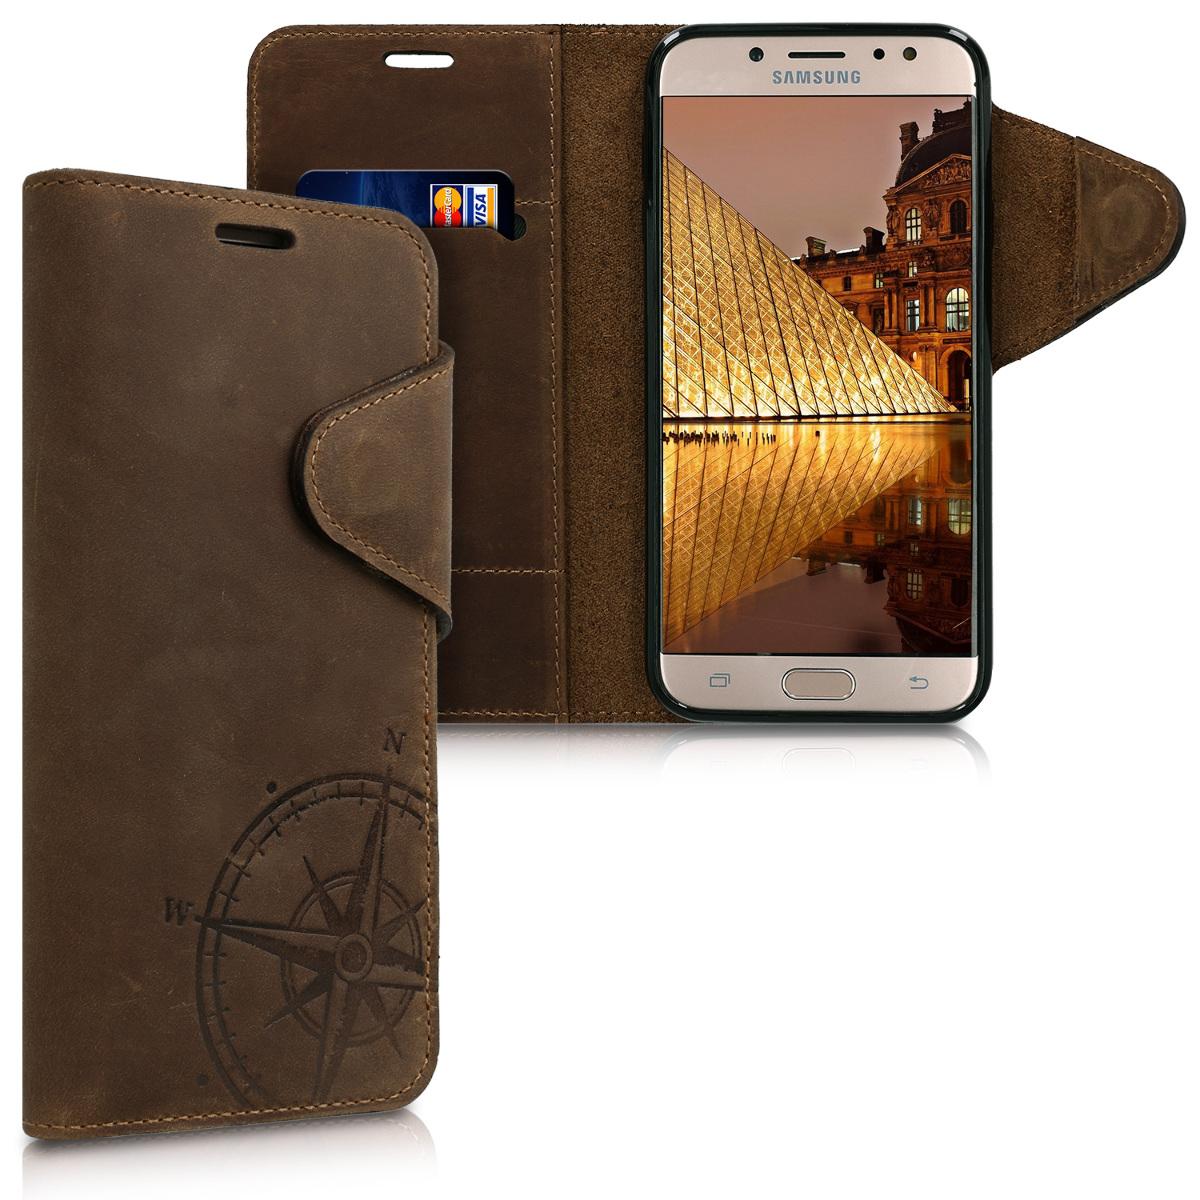 Kalibri Δερμάτινη Suede Θήκη - Πορτοφόλι Samsung Galaxy J7 2017 (Version J730F) - Brown Compass (45814.01)